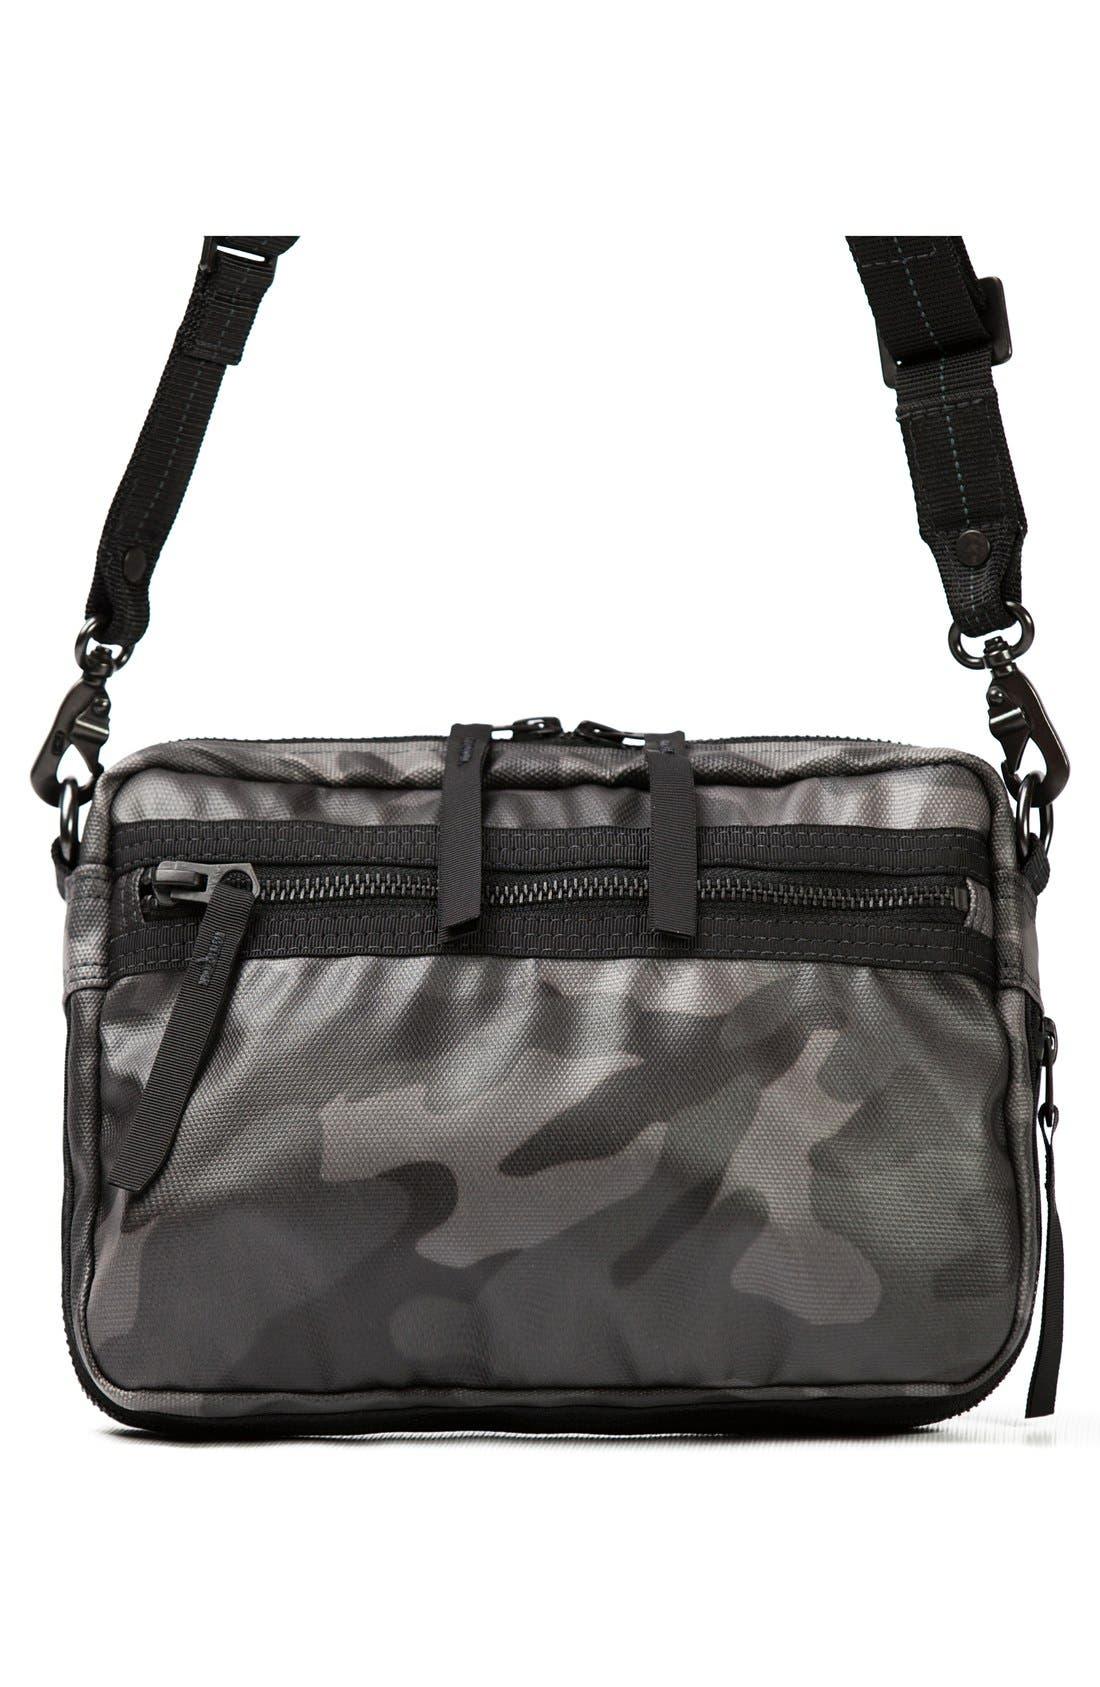 'NightHawk' Shoulder Bag,                             Alternate thumbnail 2, color,                             Camo